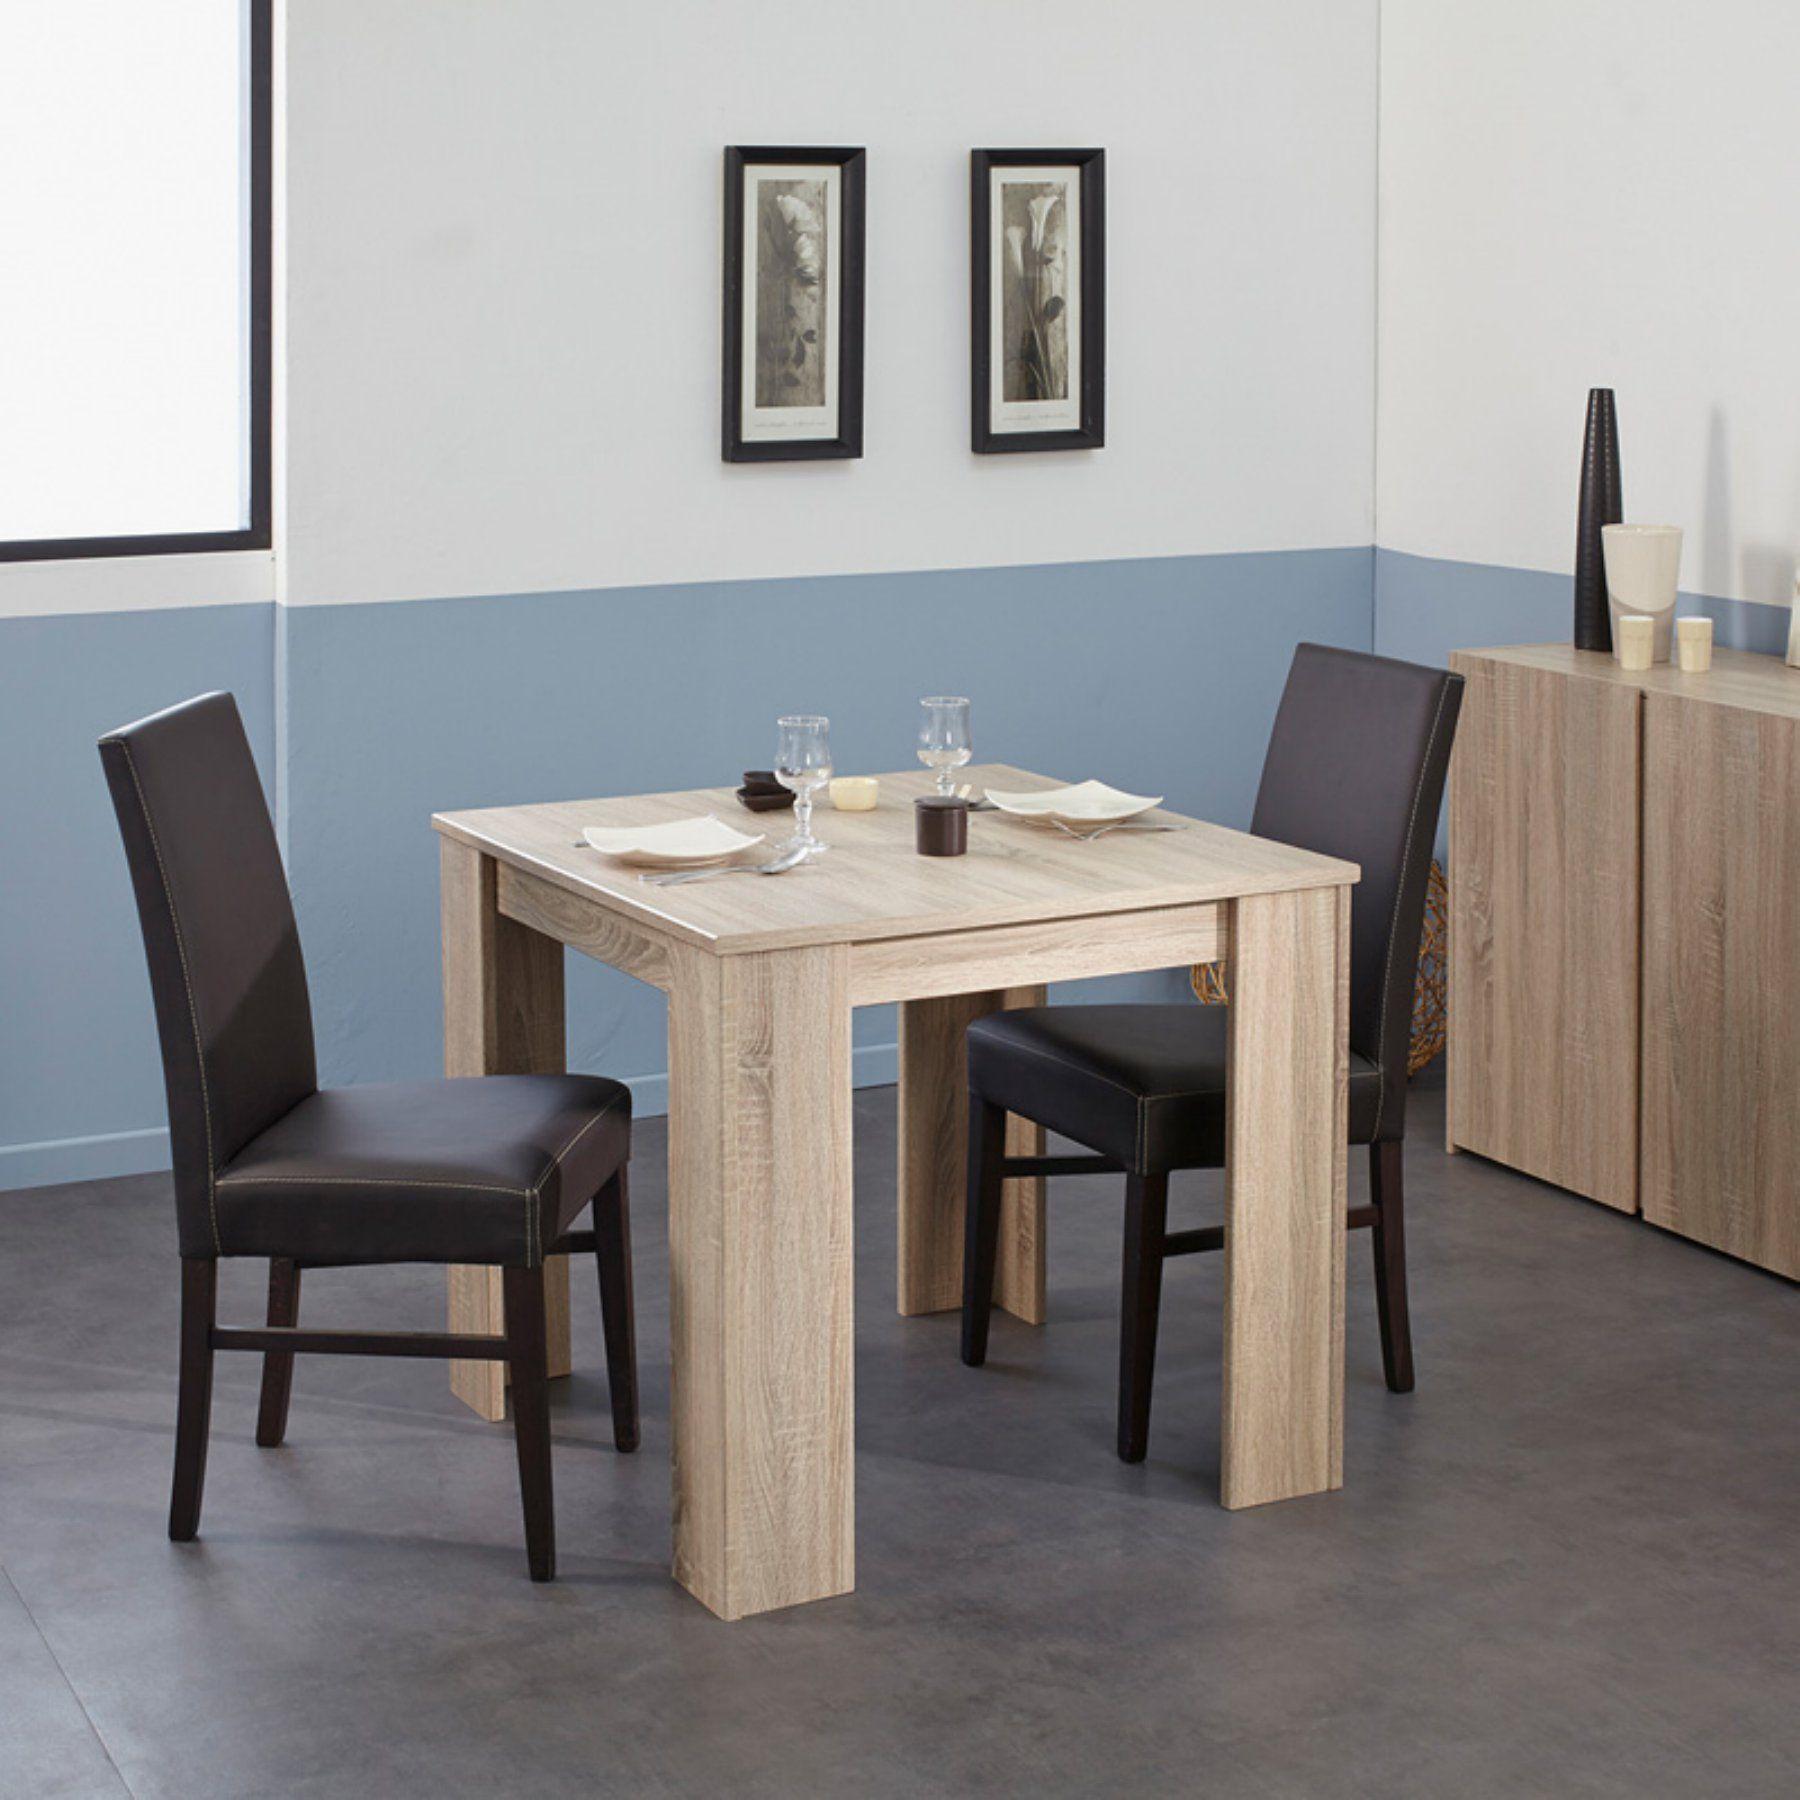 Parisot Karan Square Extendable Dining Table Dining Table